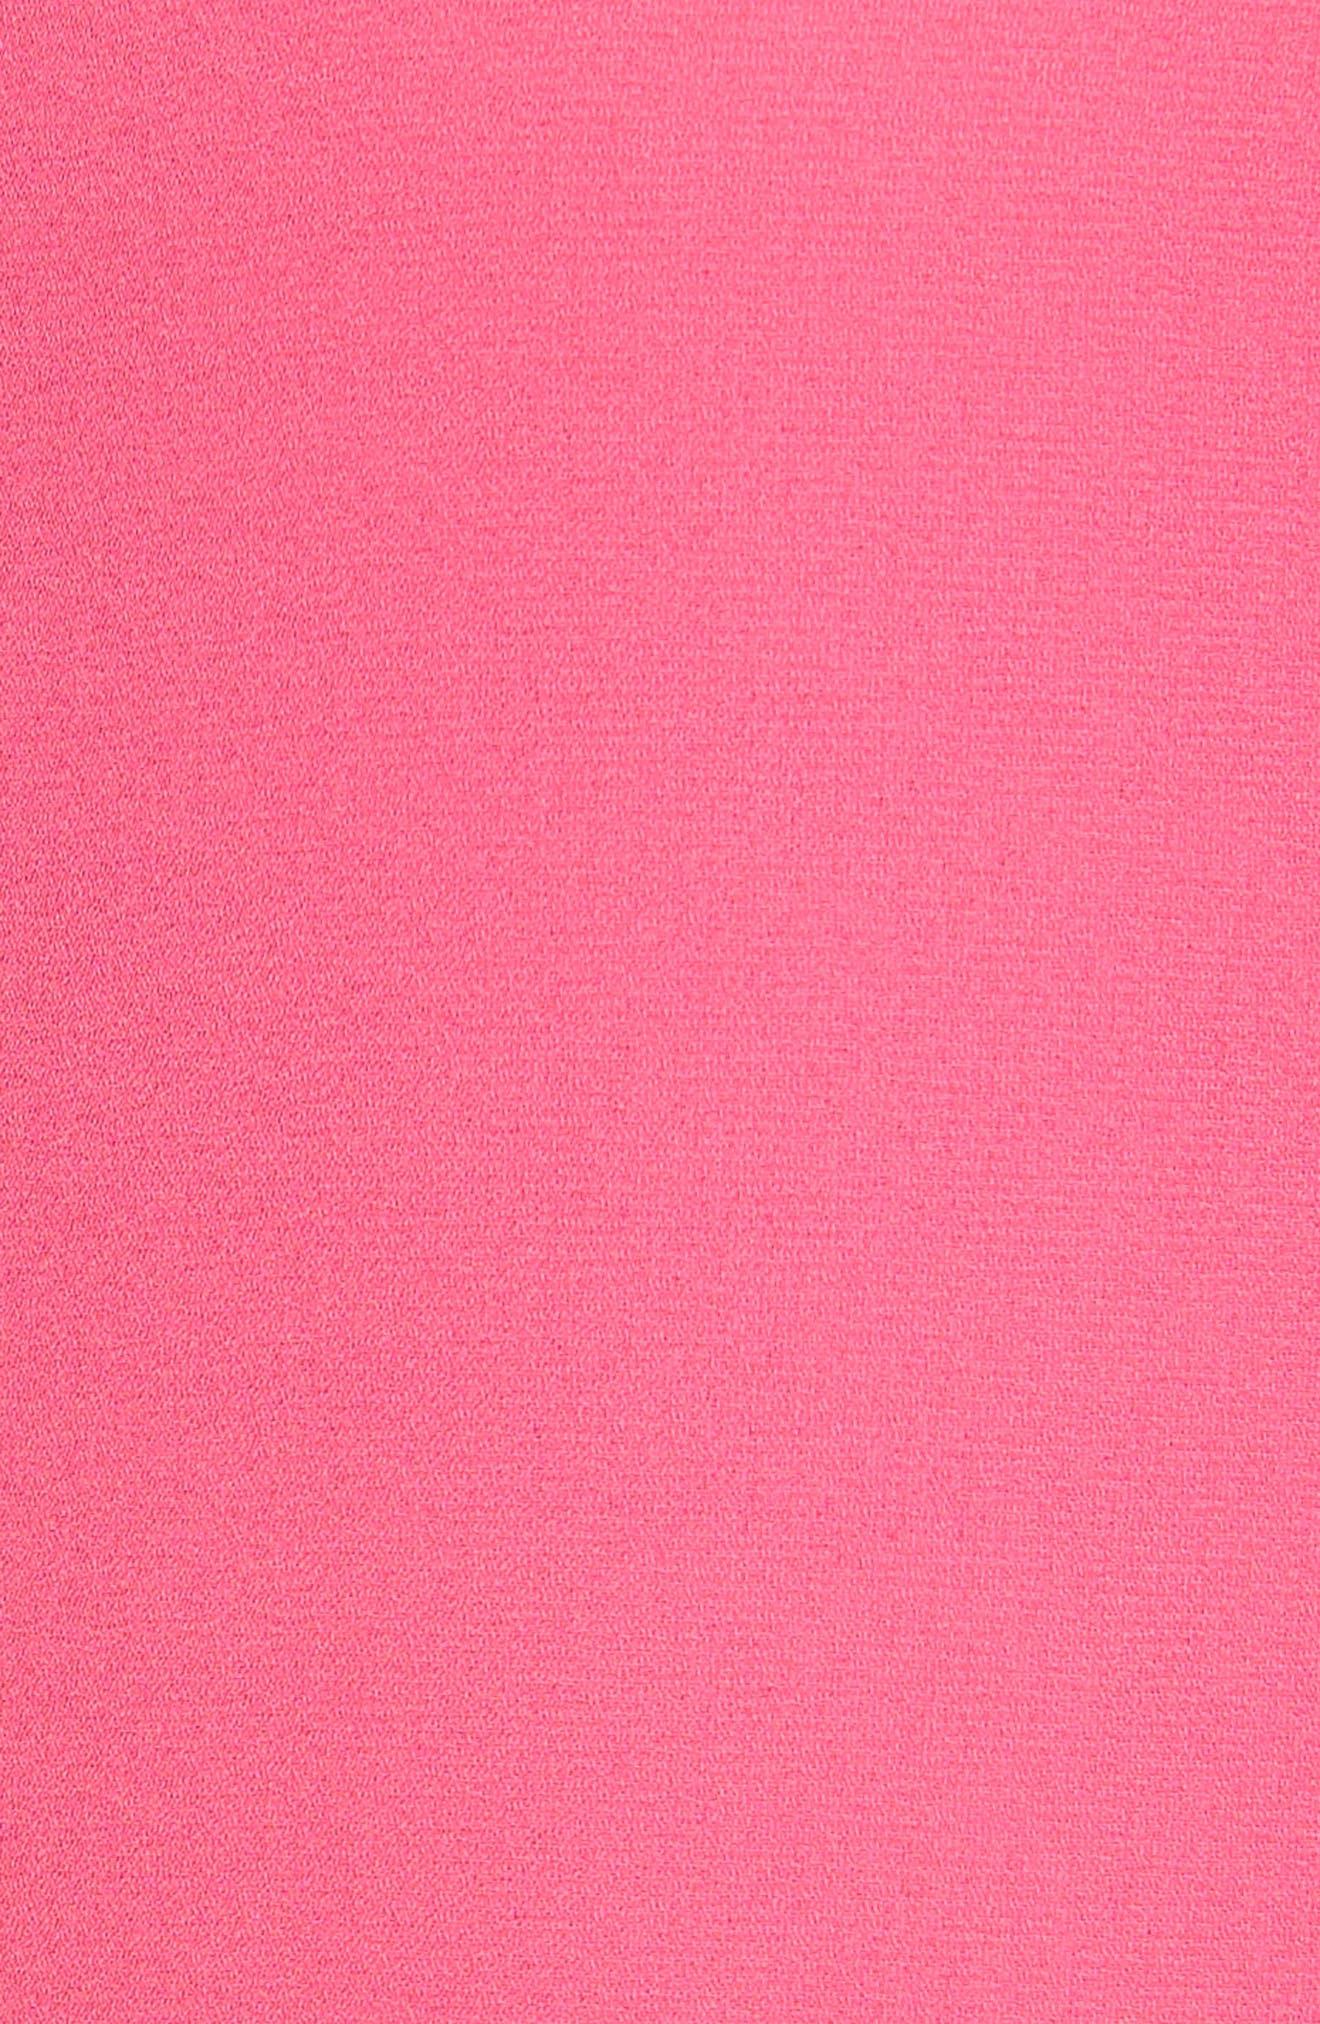 Ruffle Sleeve Peplum Stretch Cotton Blend Top,                             Alternate thumbnail 6, color,                             Pink Cabaret